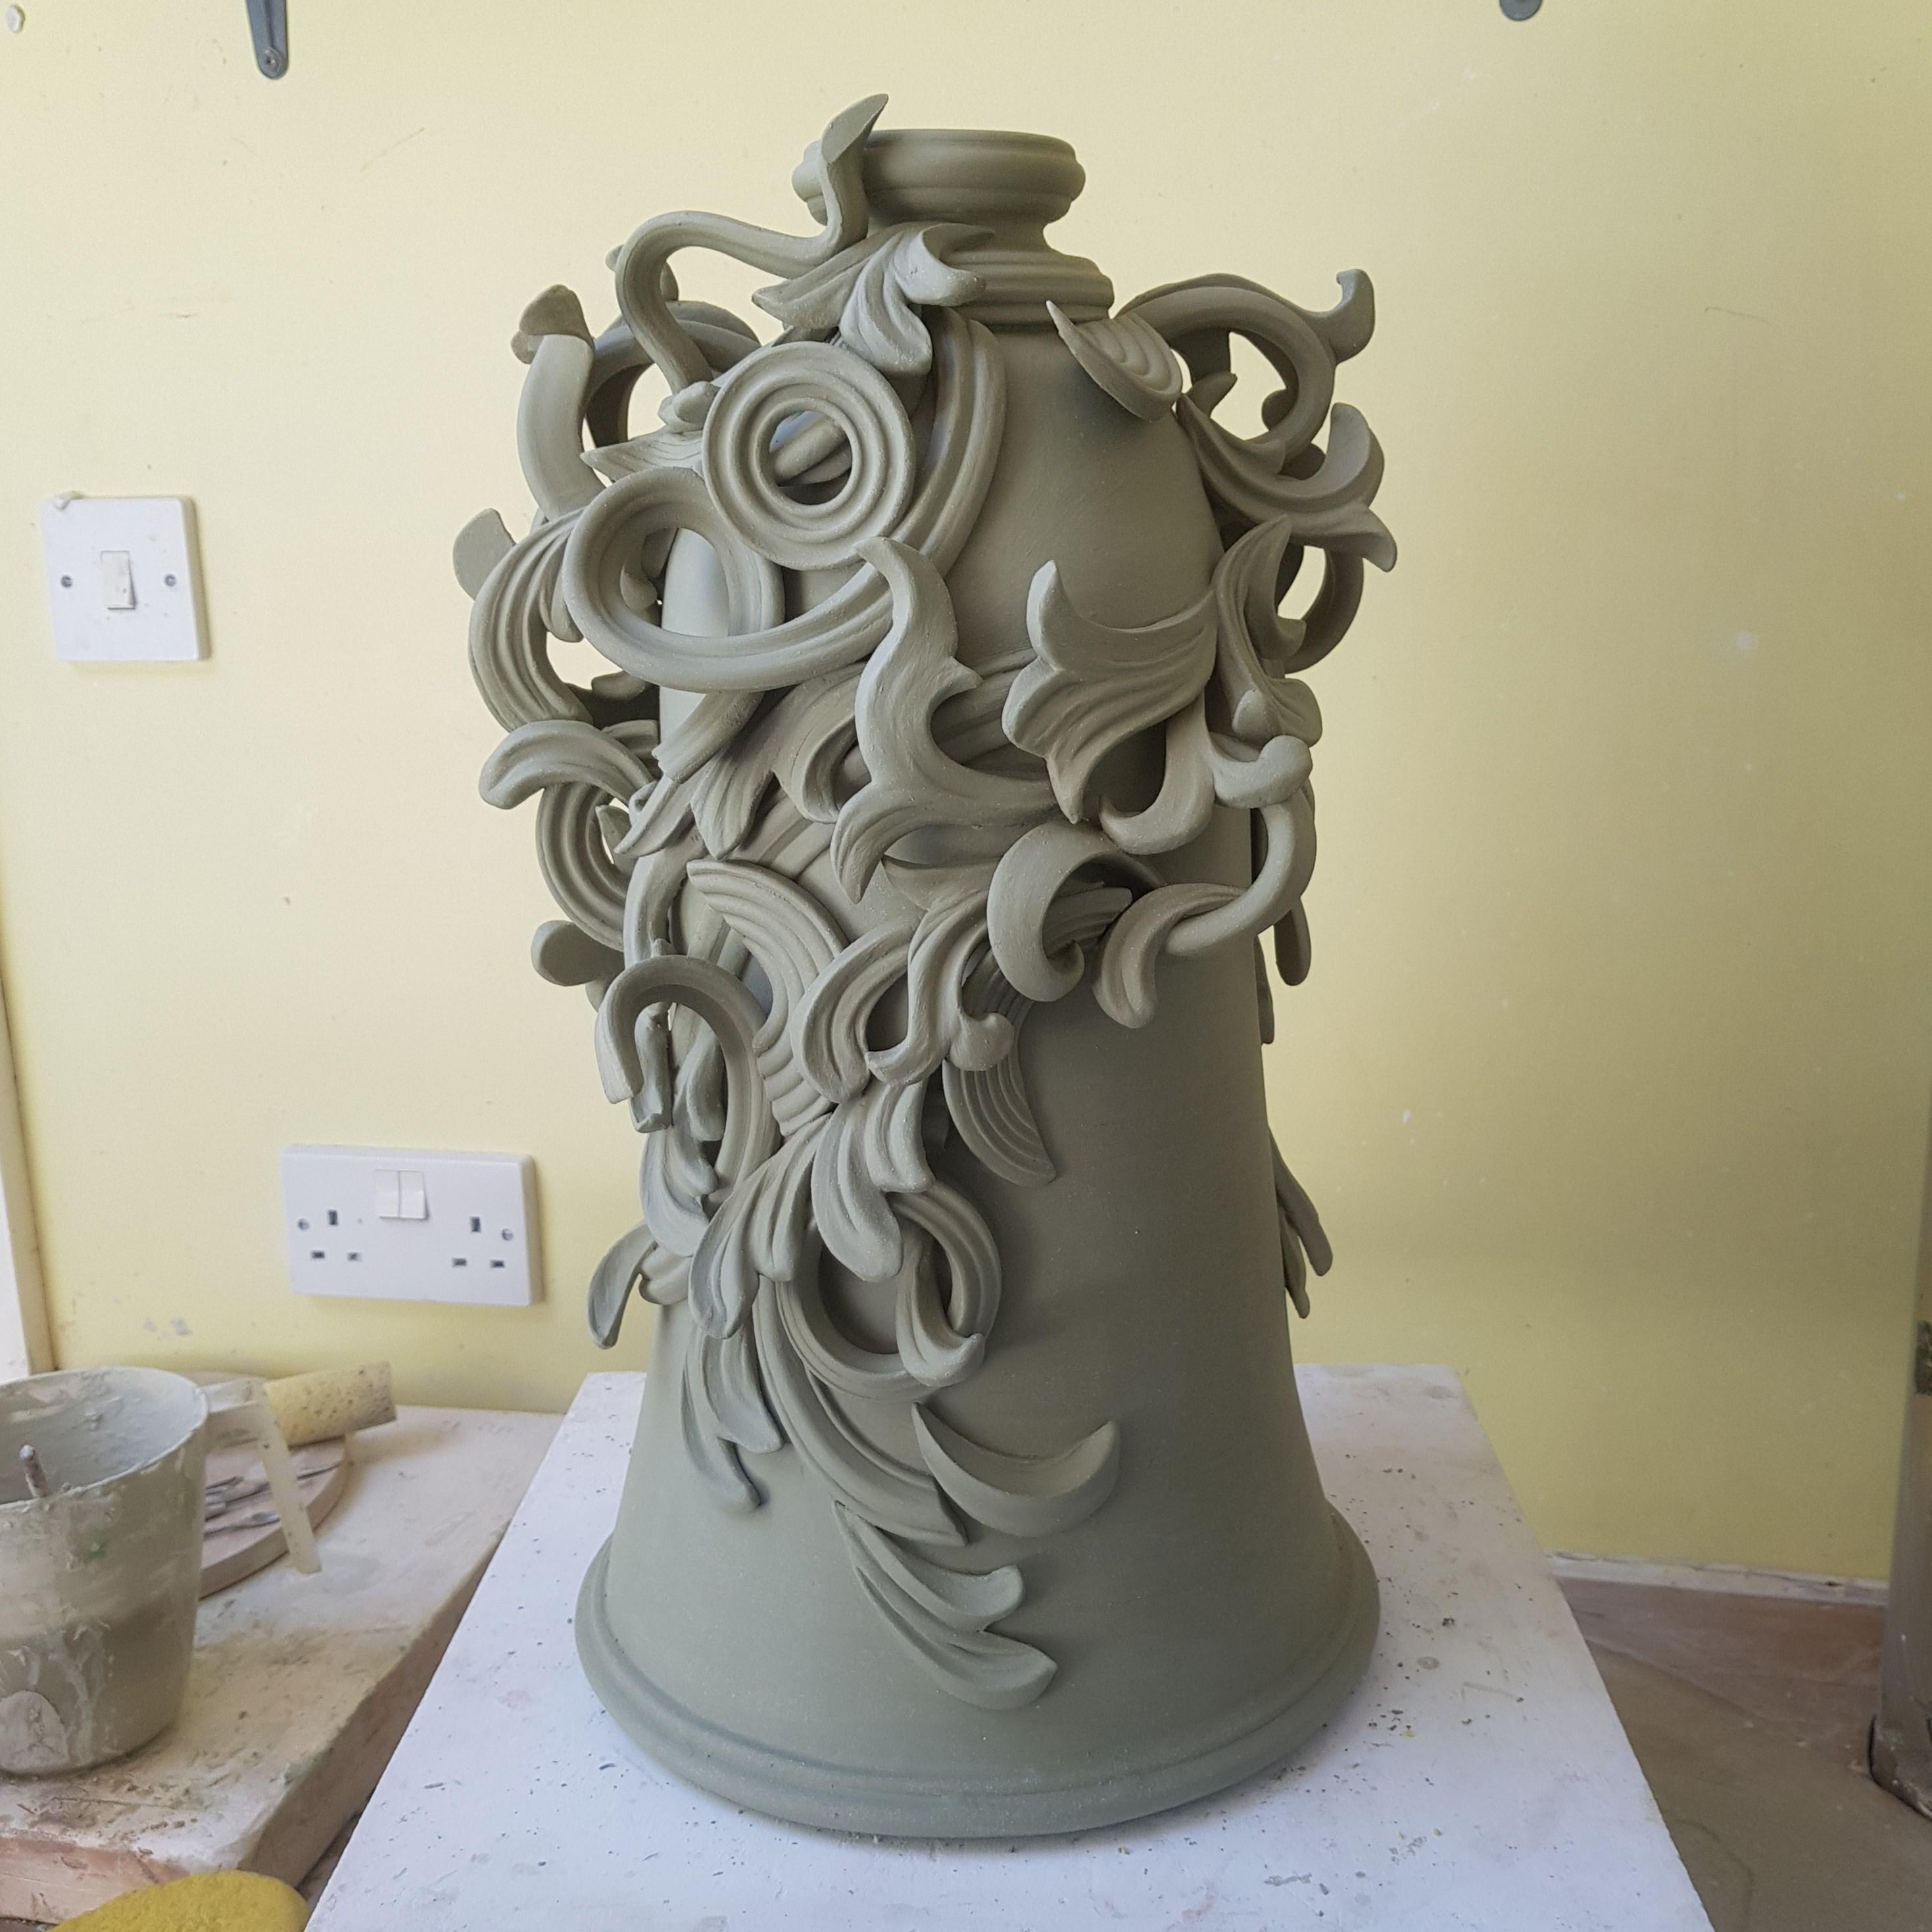 jo taaylor decorative vase art clay sculpture in progress